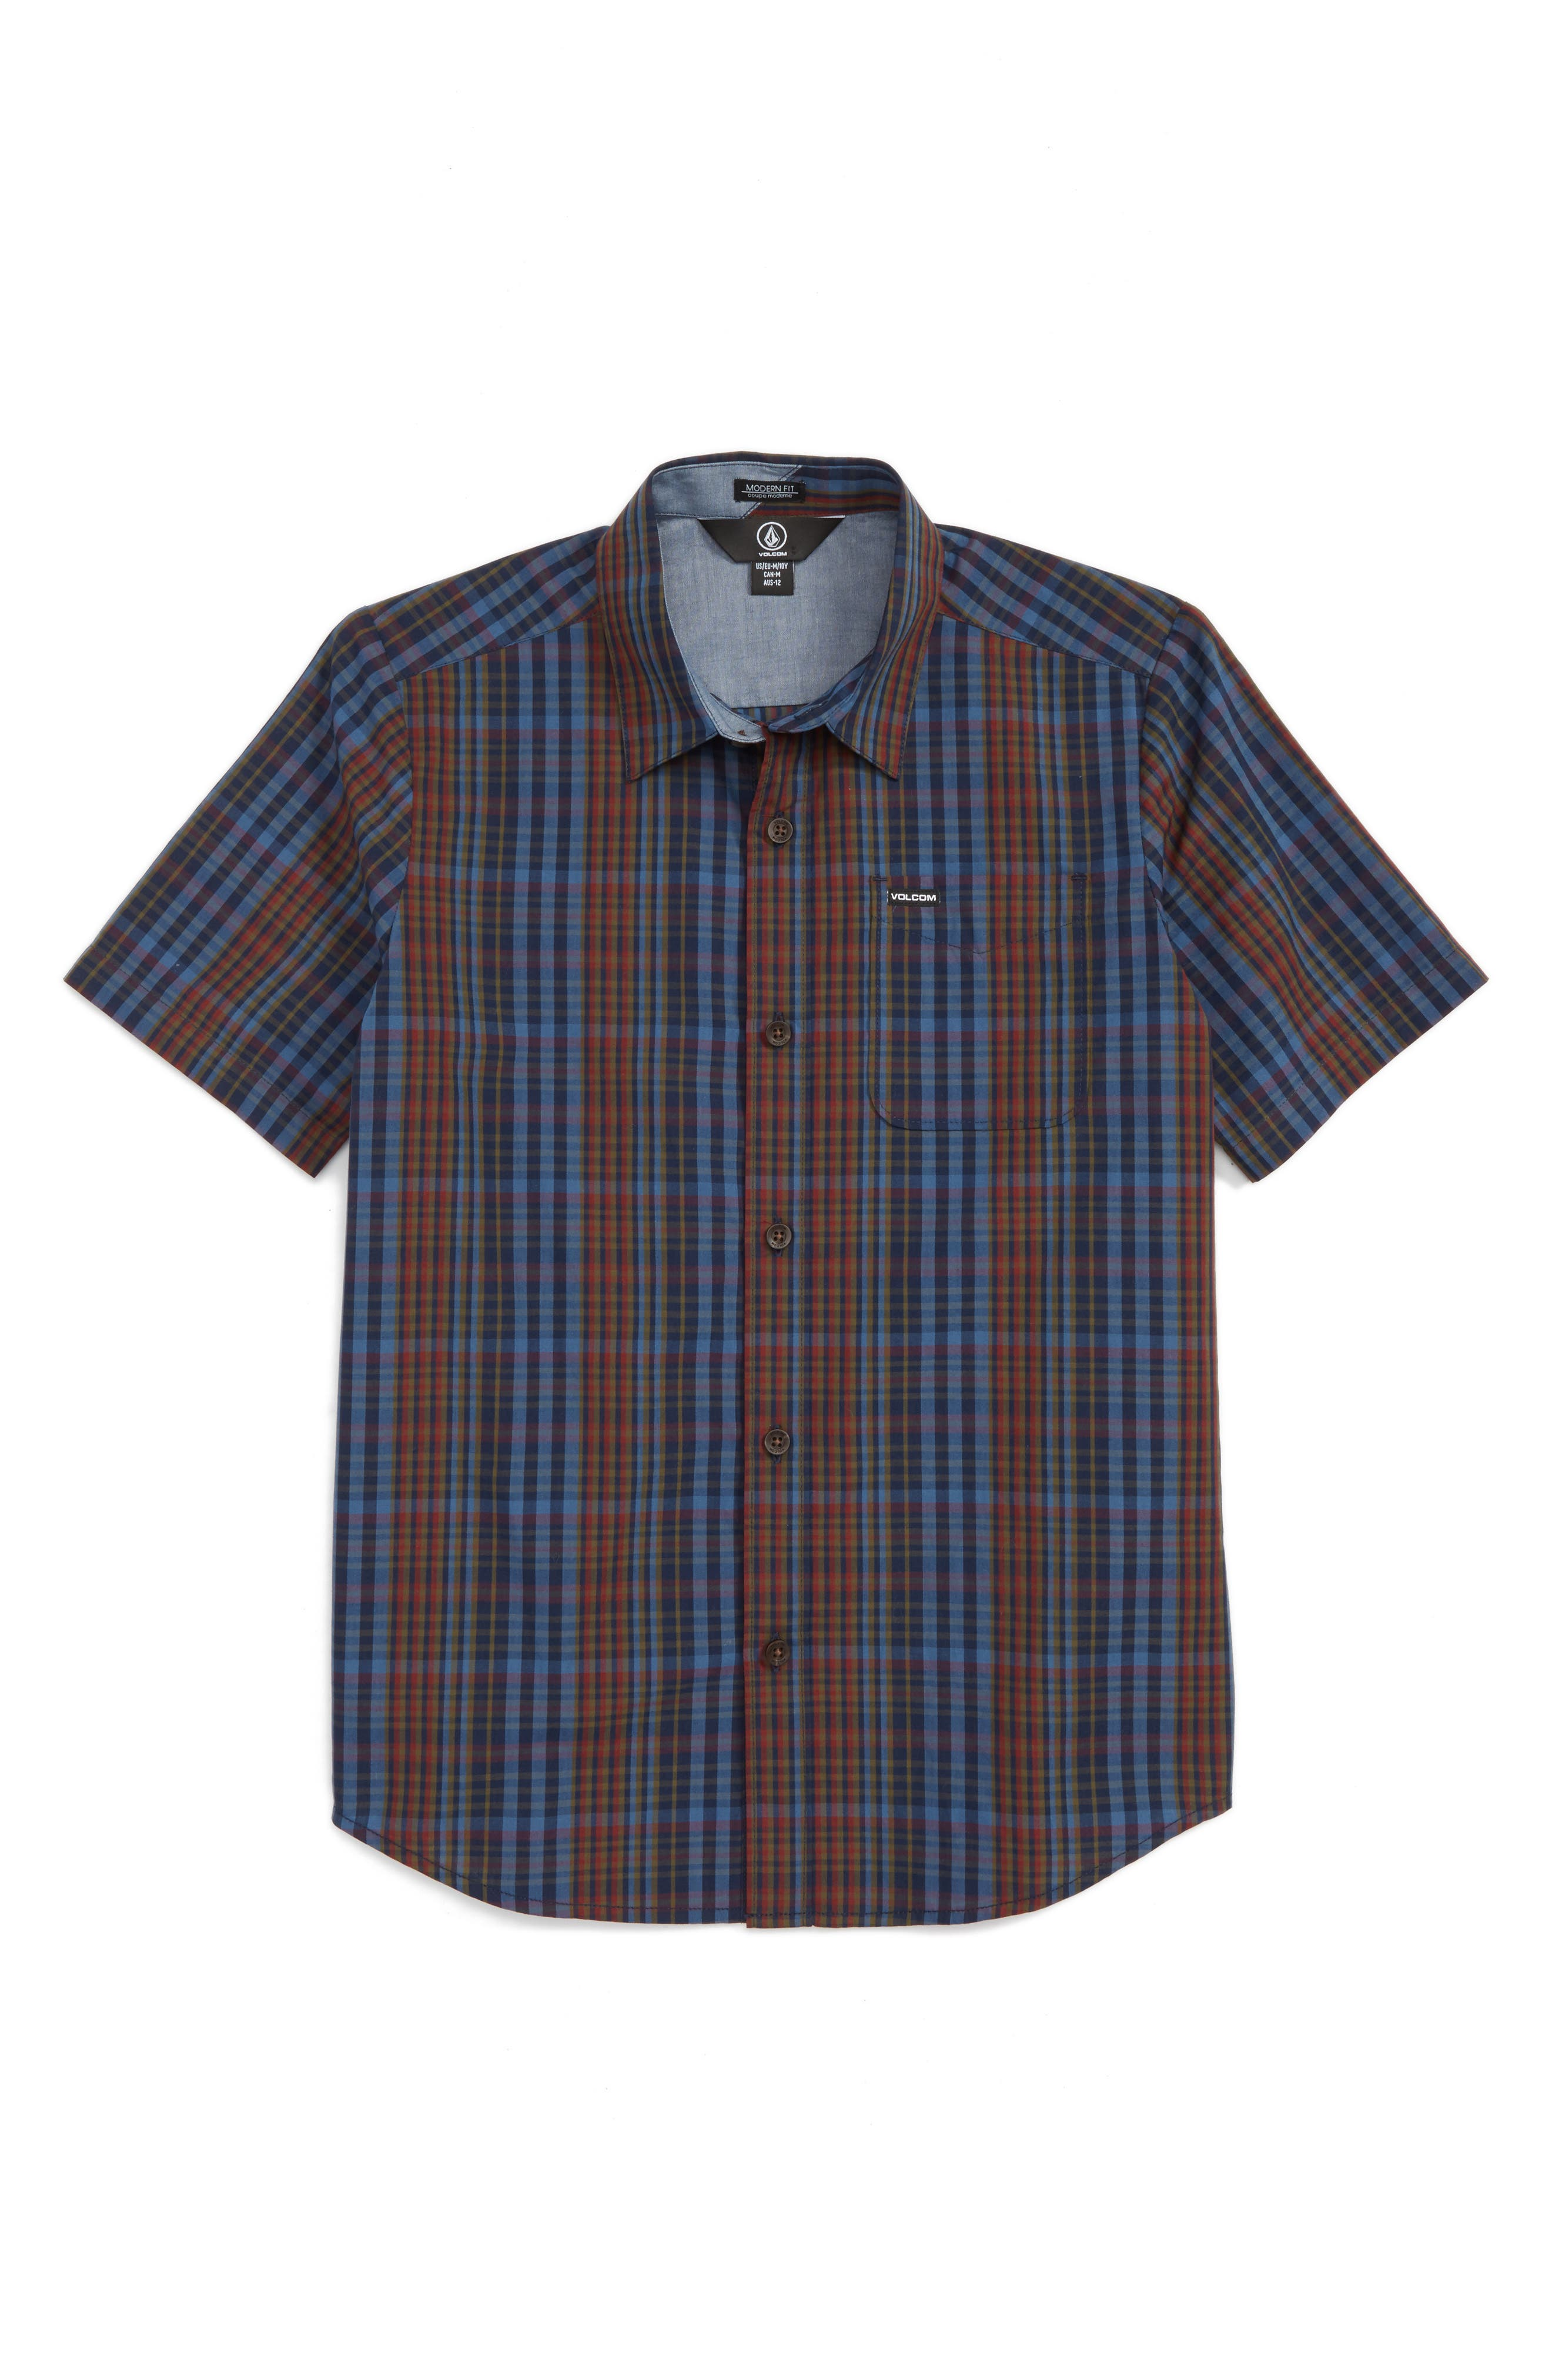 Volcom Hugo Plaid Woven Shirt (Toddler Boys, Little Boys & Big Boys)